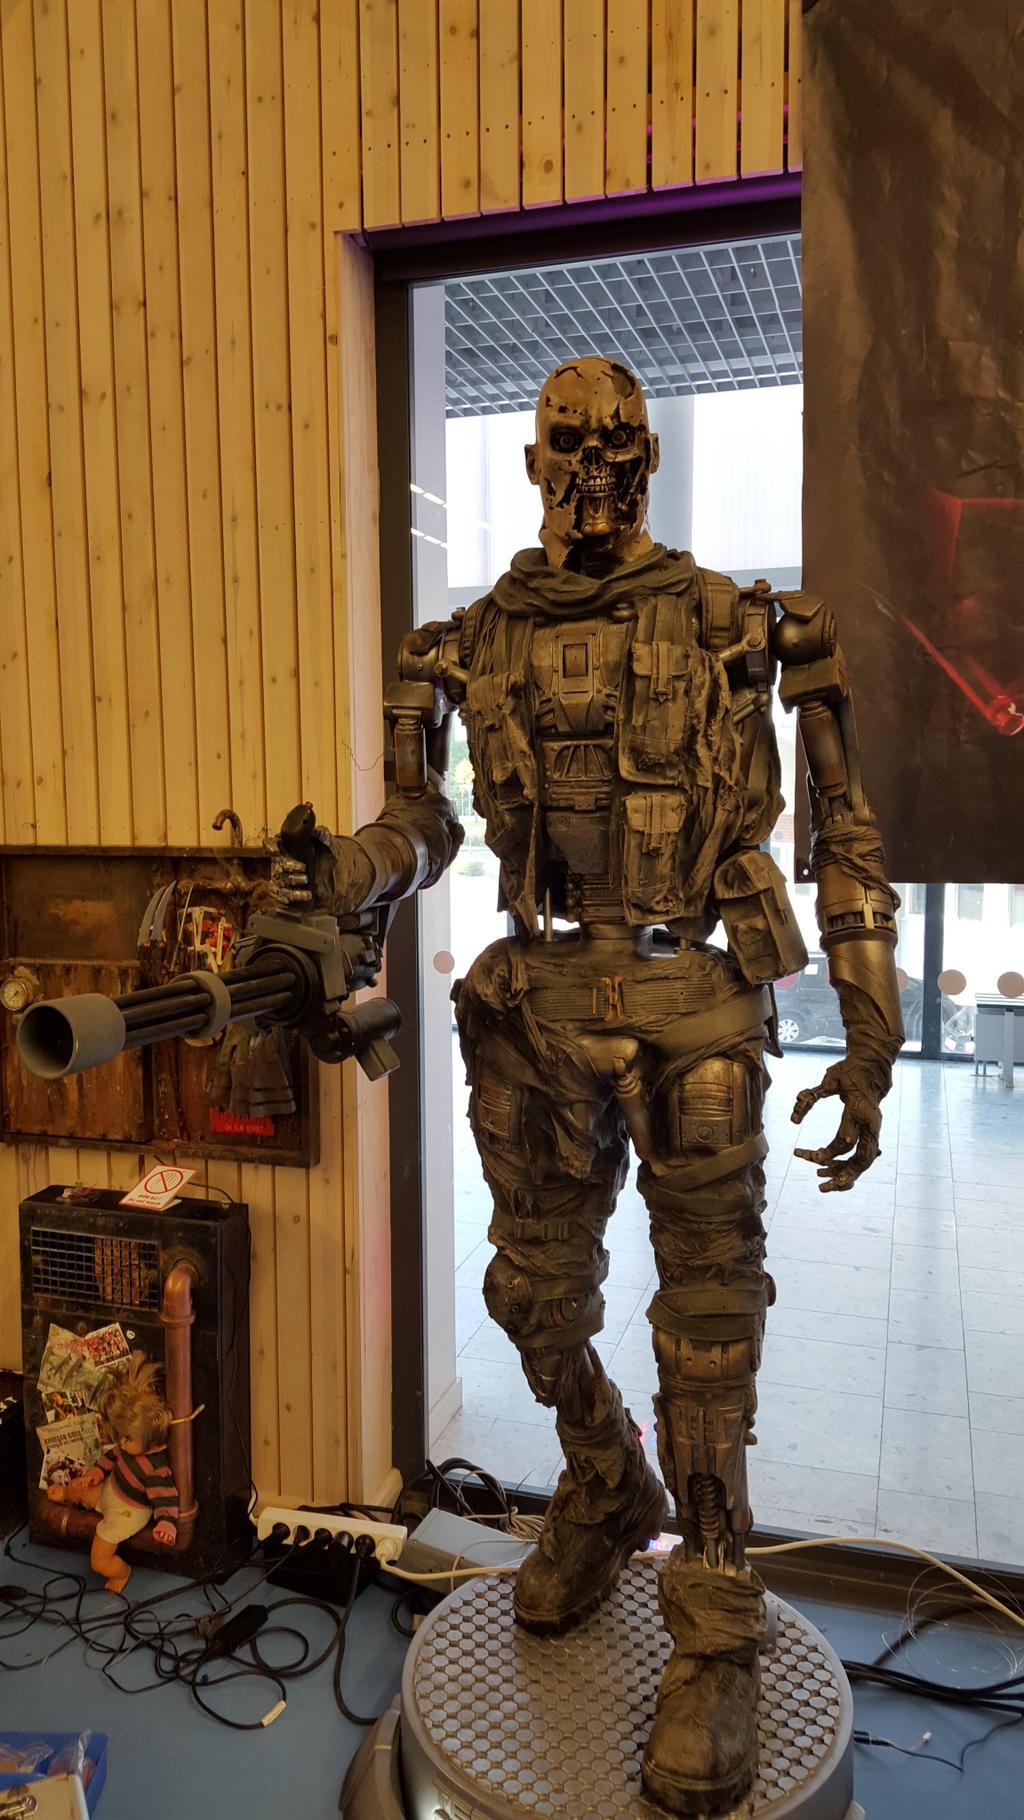 Terminator by EgonEagle